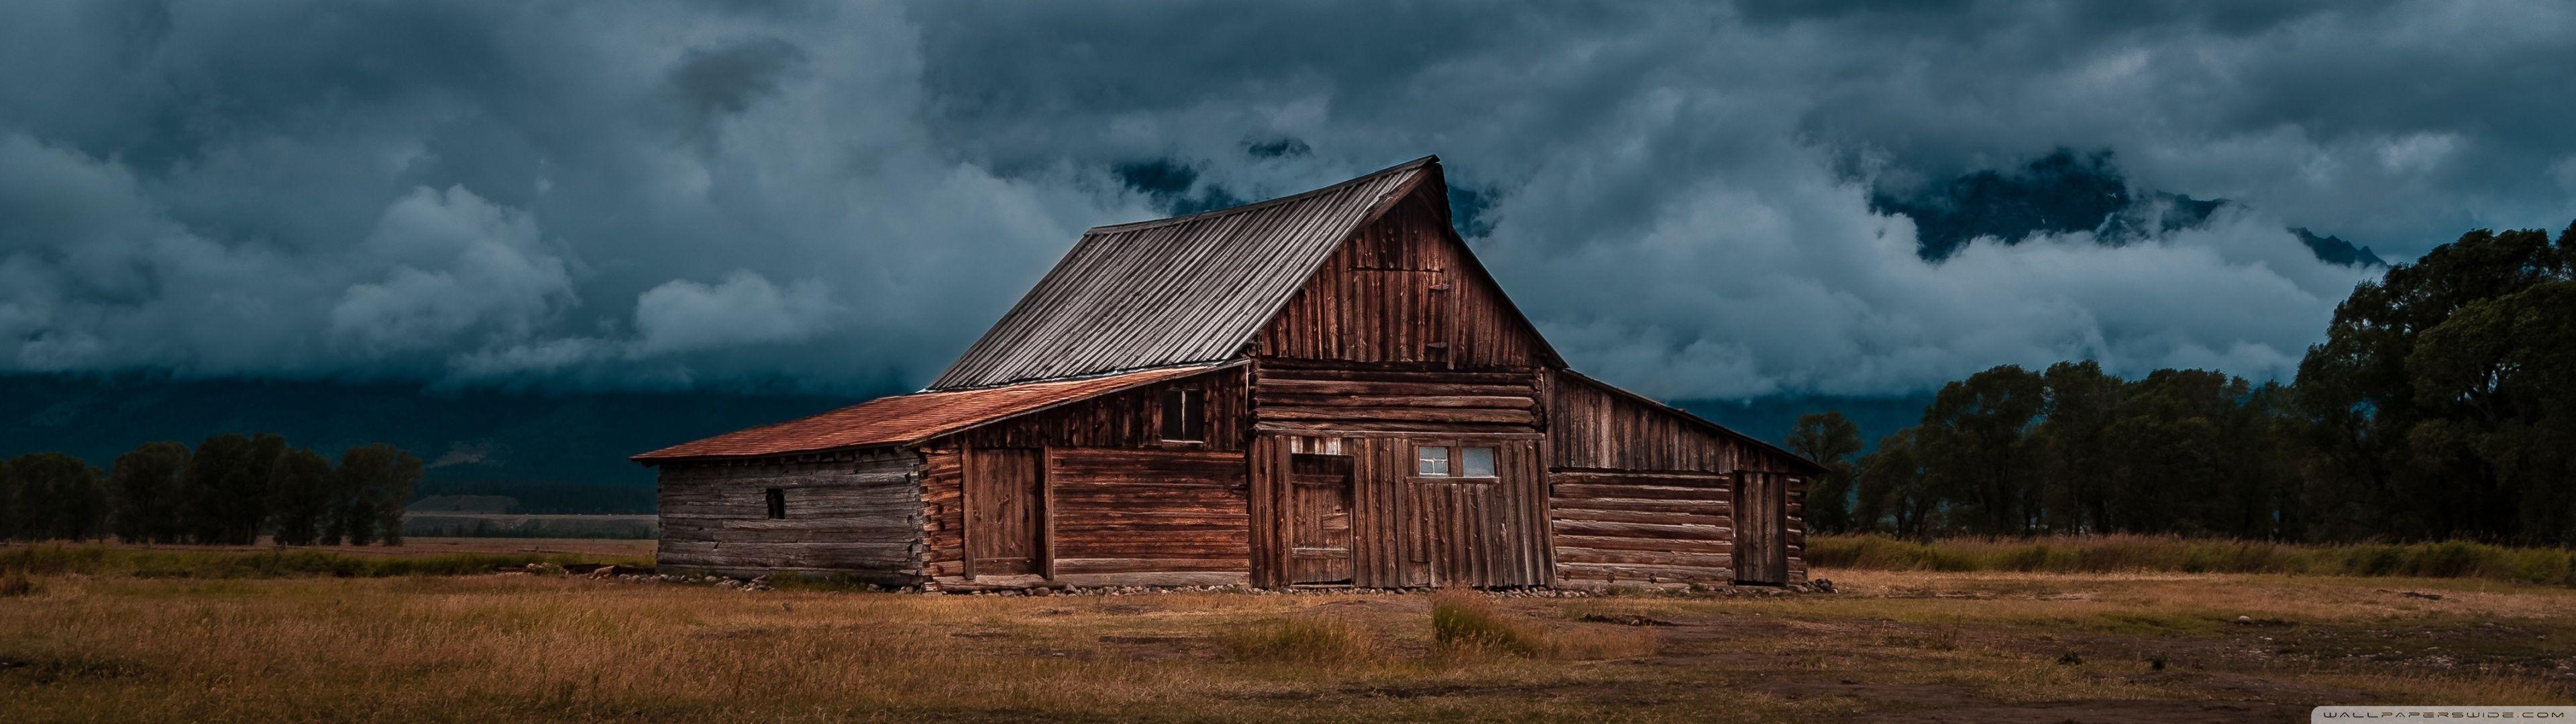 Abandoned Barn Dual Monitor Wallpaper 3840x1080